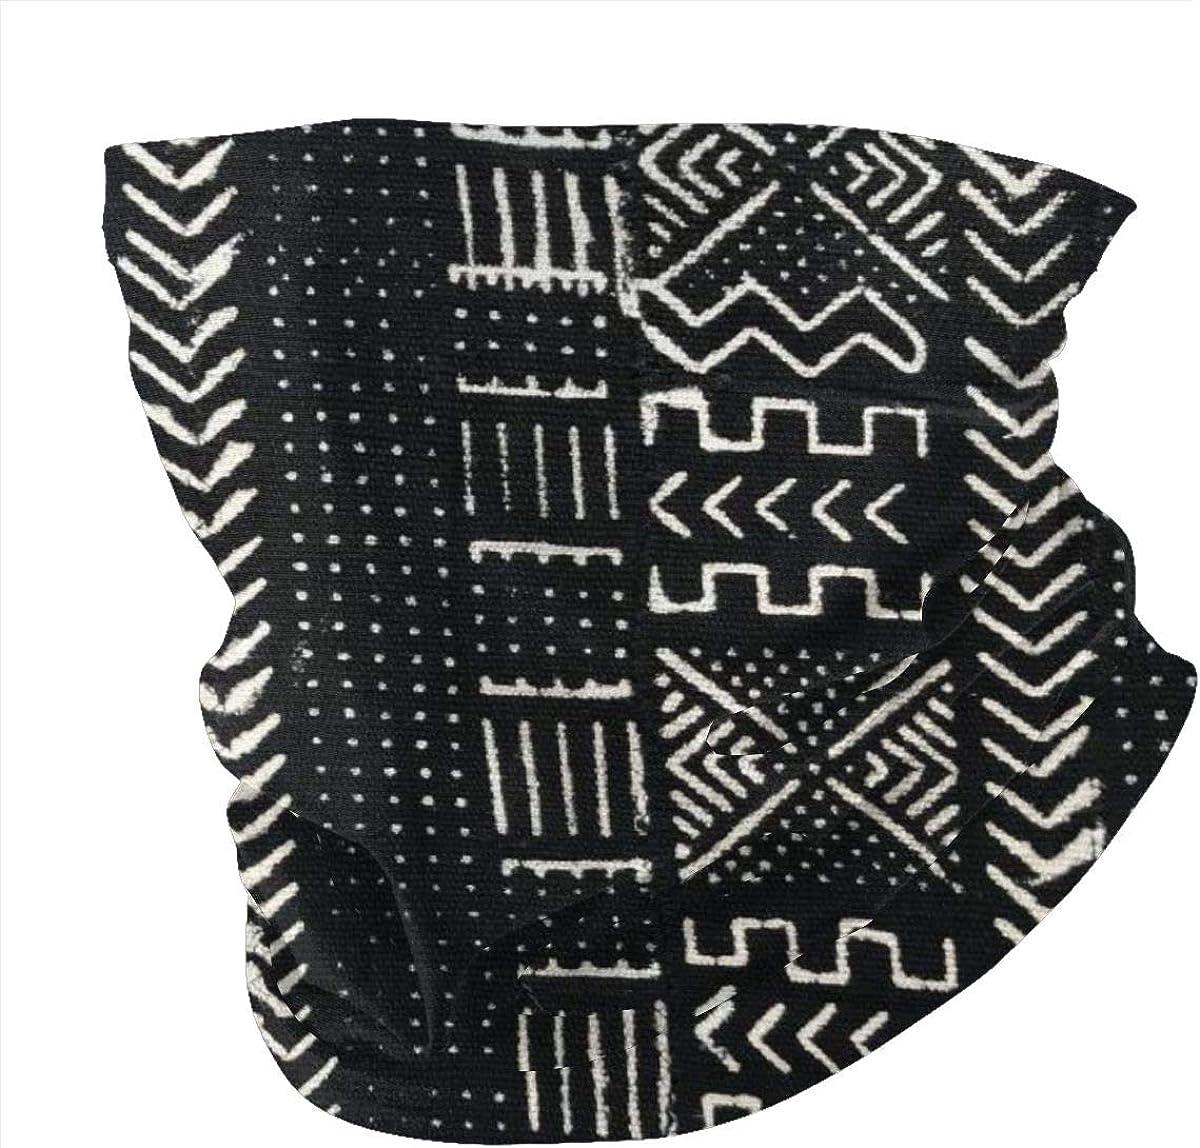 Seamless Quick Dry Breathable Outdoor UV Protection Harlem Mud Cloth Head Wrap Face Scarf Neck Gaiter Bandana Balaclava Black